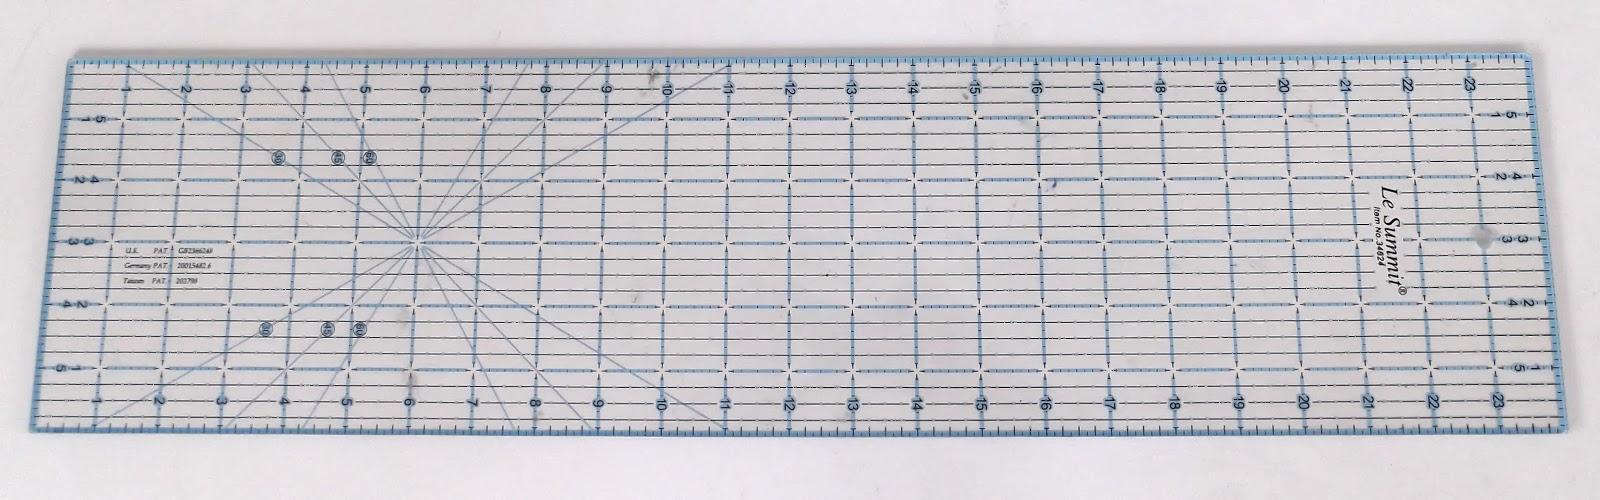 quilting ruler, transparent ruler, fabric ruler, patchwork ruler